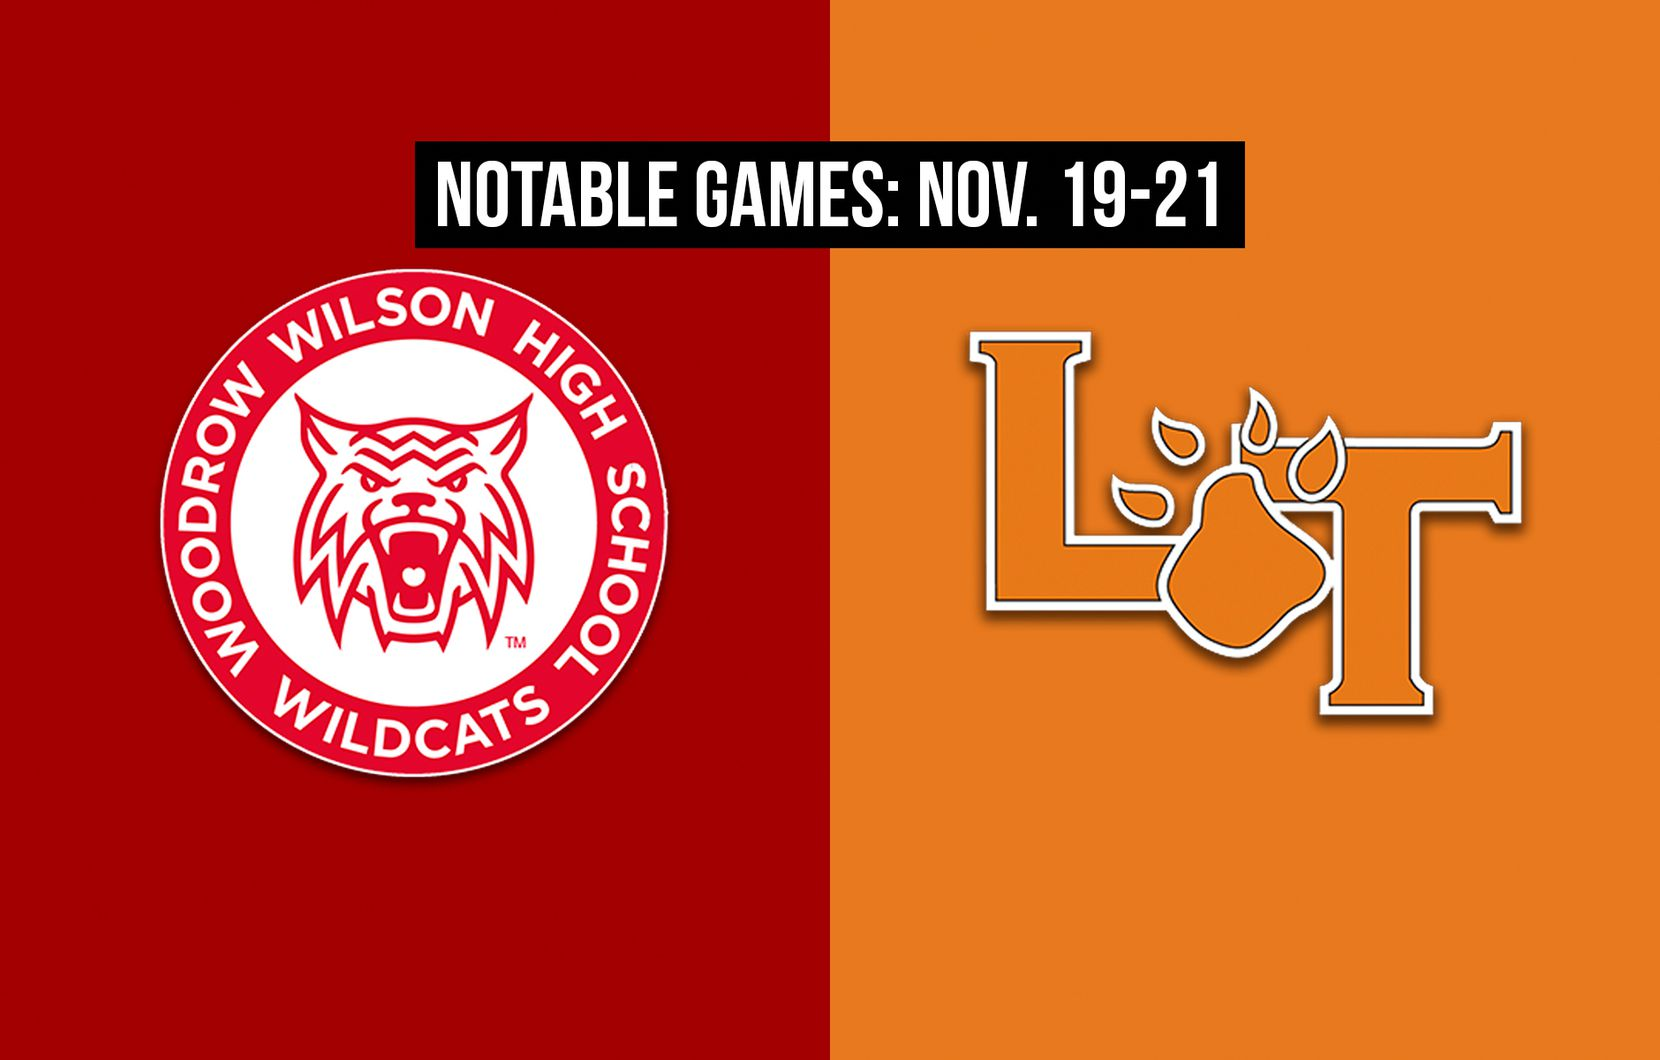 Notable games for the week of Nov. 19-21 of the 2020 season: Woodrow Wilson vs. Lancaster.